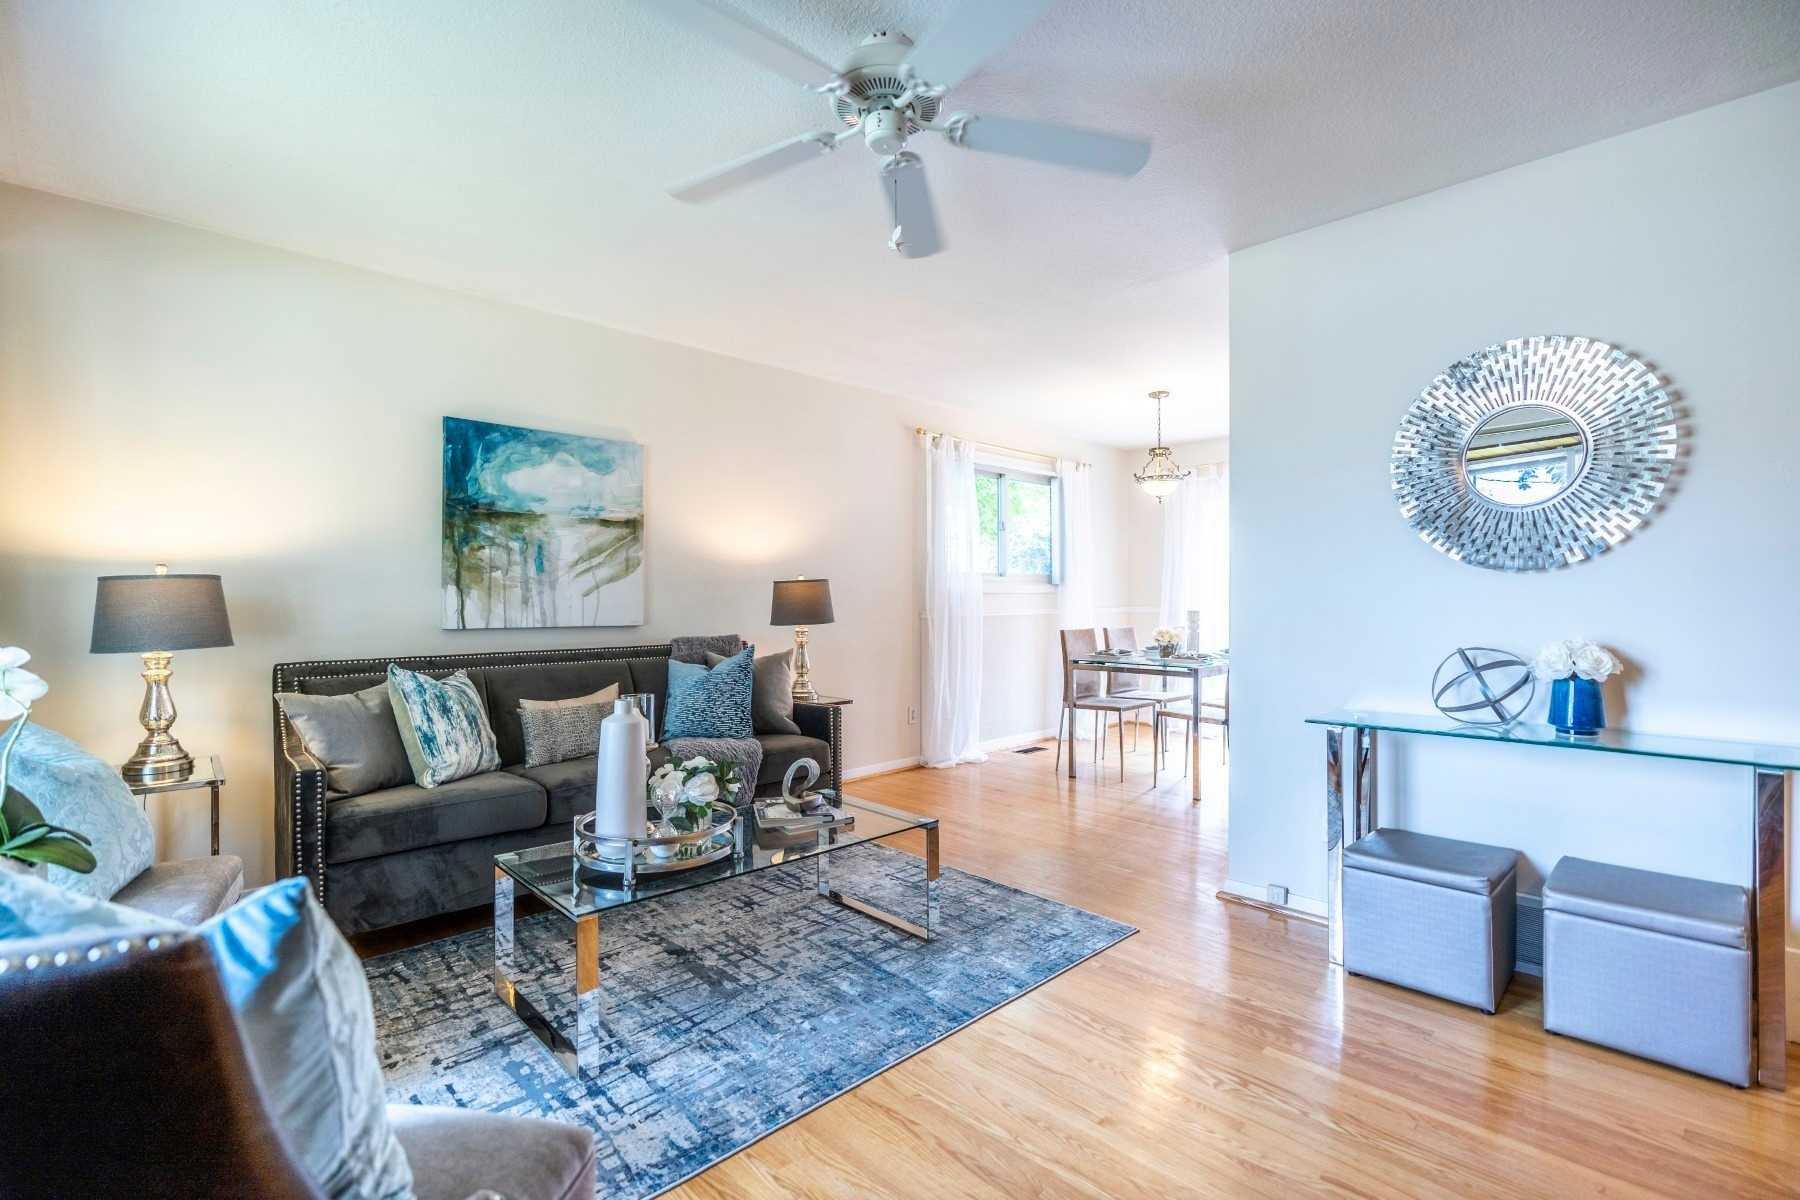 Photo 5: Photos: 1140 Northridge Street in Oshawa: Centennial House (Bungalow) for sale : MLS®# E4571459